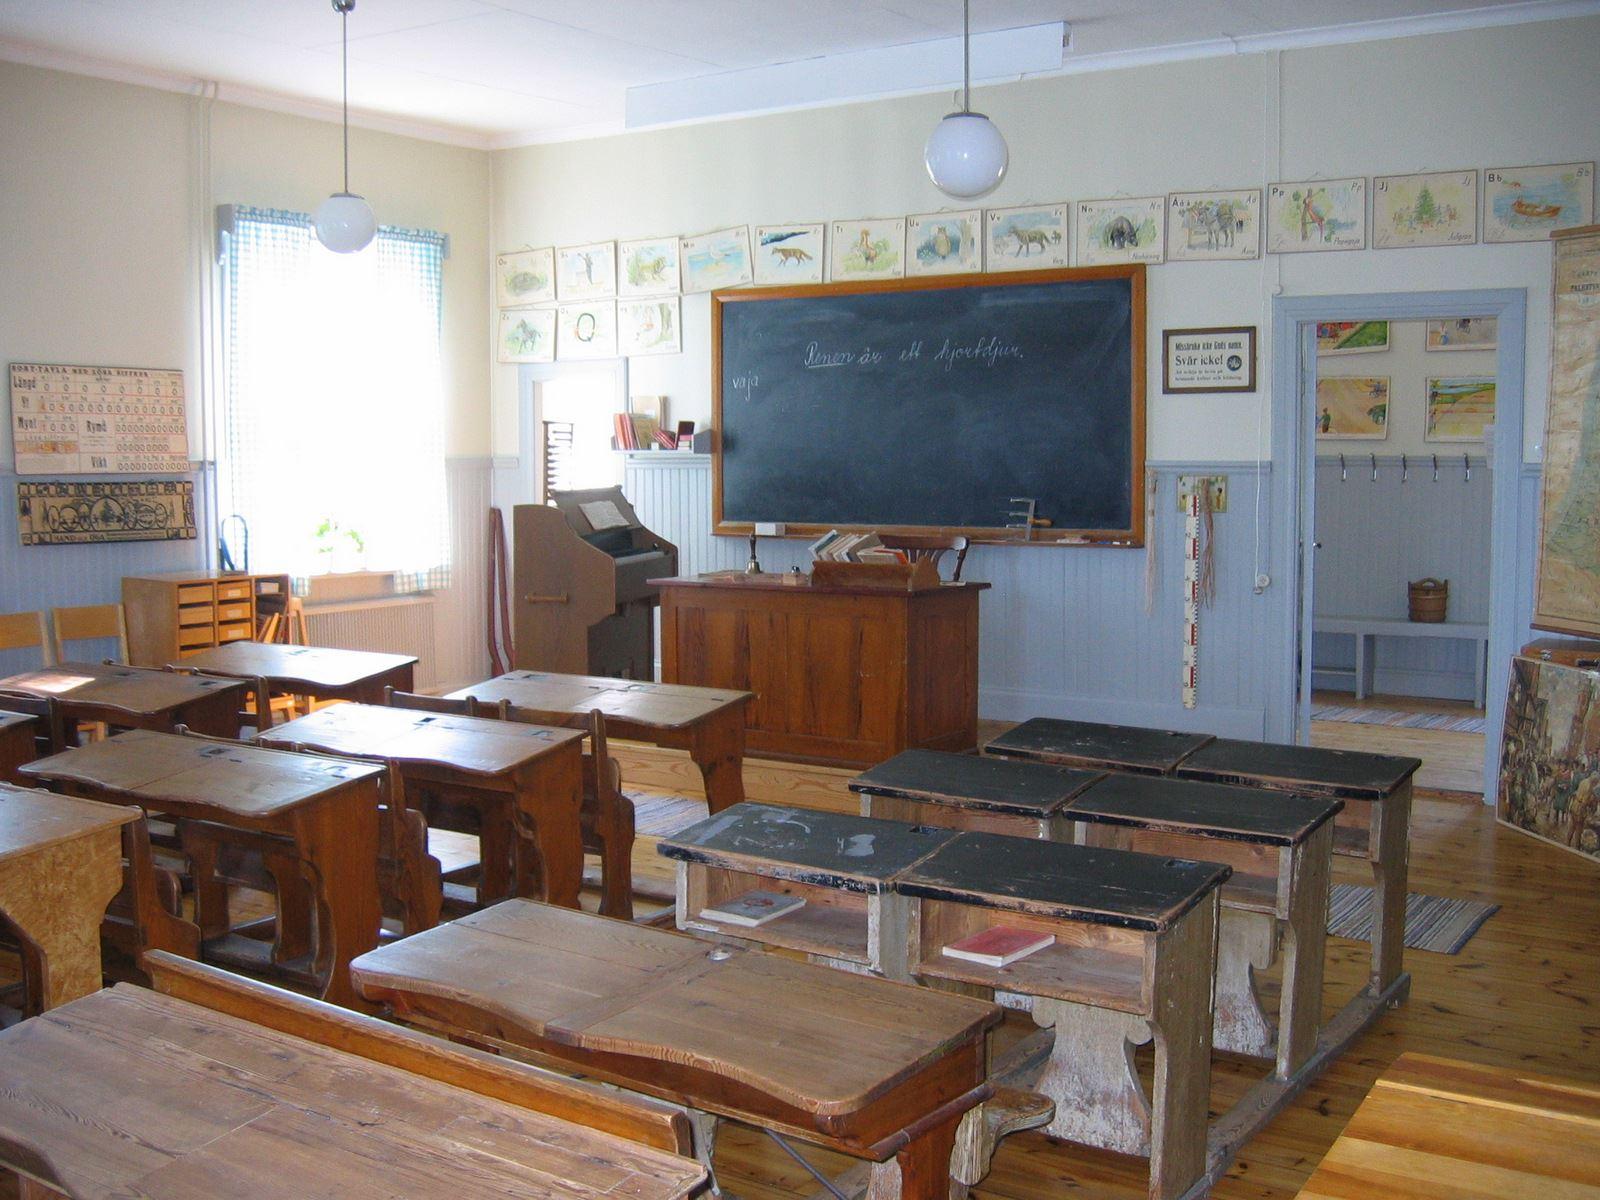 Gislaveds kommun,  © Gislaveds kommun, ölmestads schollmuseum